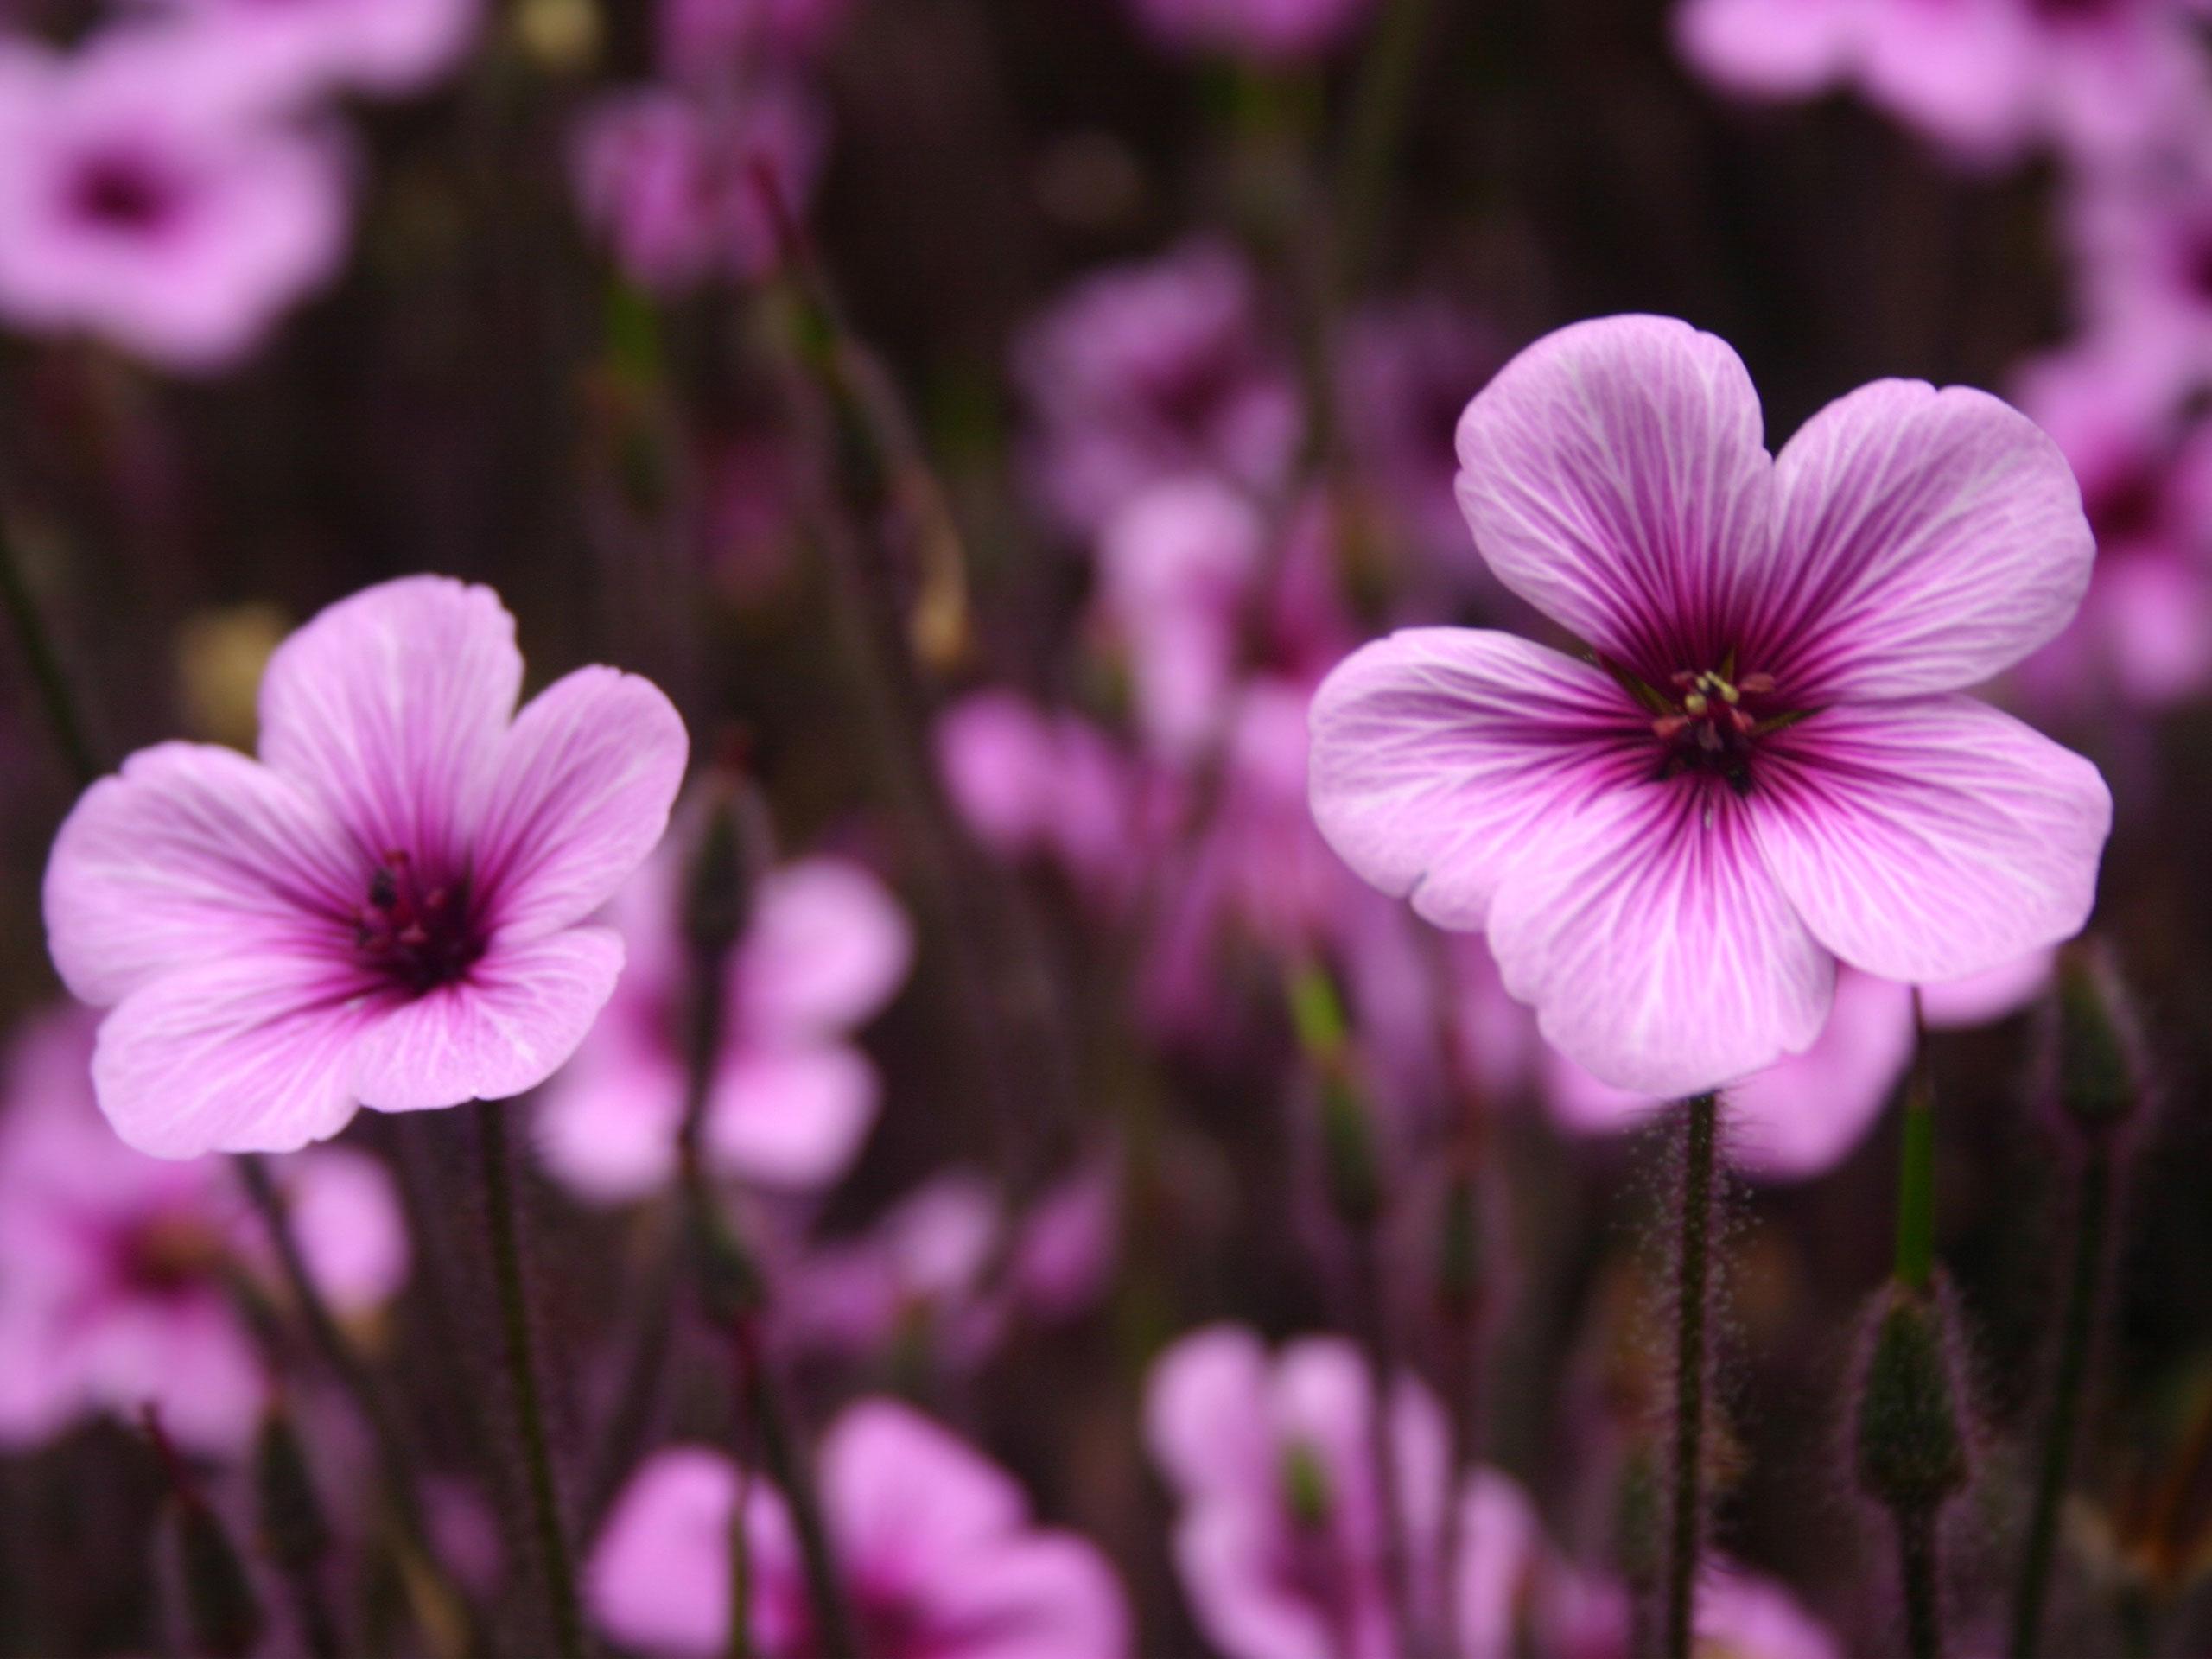 Purple Flowers Wallpapers HD Wallpapers 2560x1920